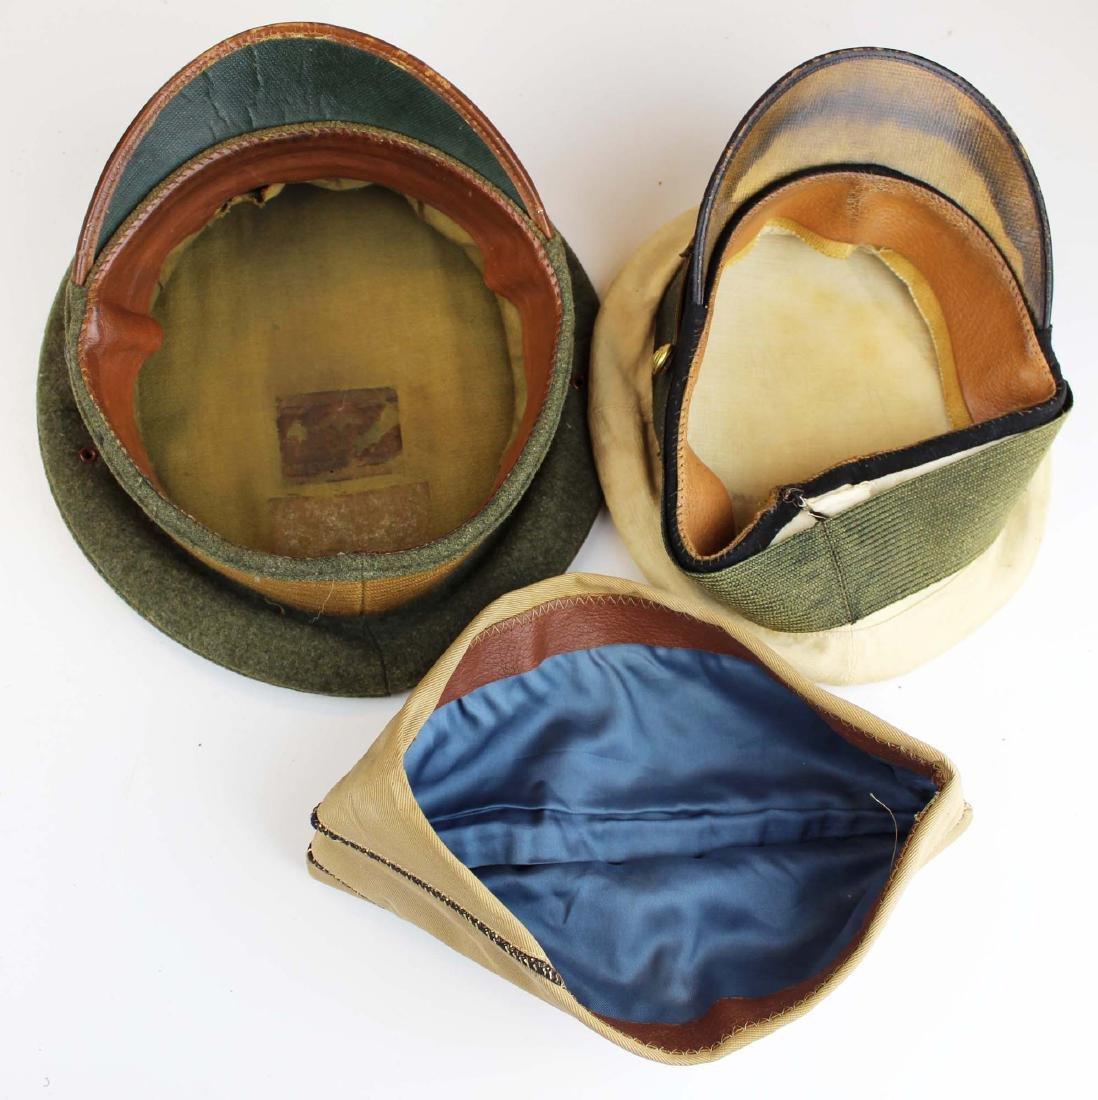 US Navy visor caps, badge, photos, etc. - 9